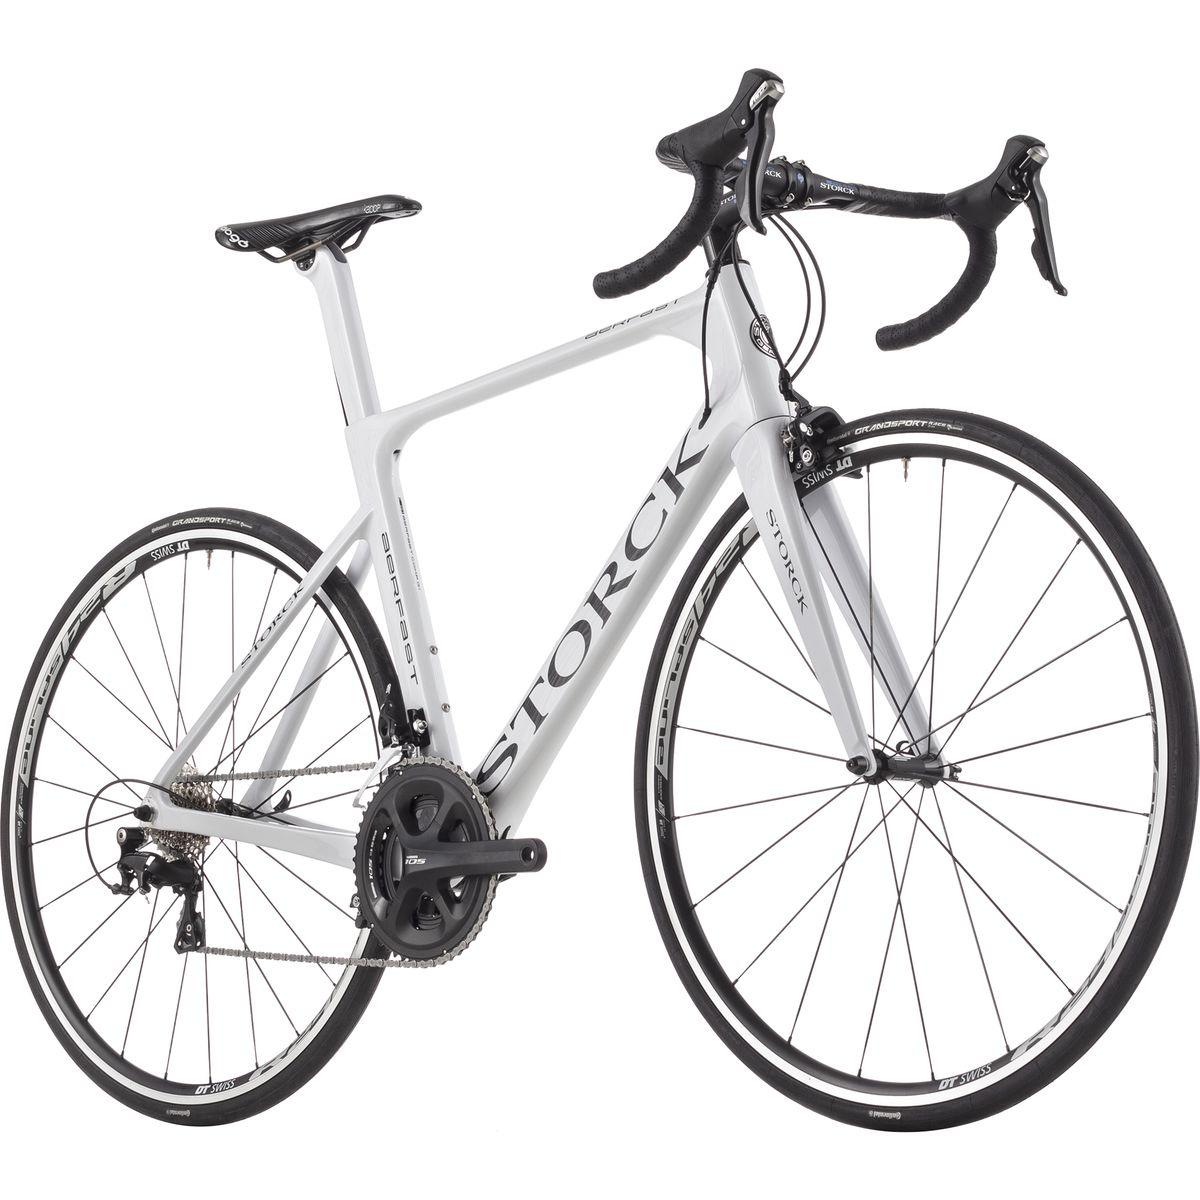 Storck Aerfast Comp Shimano 105 Complete Road Bike 2016